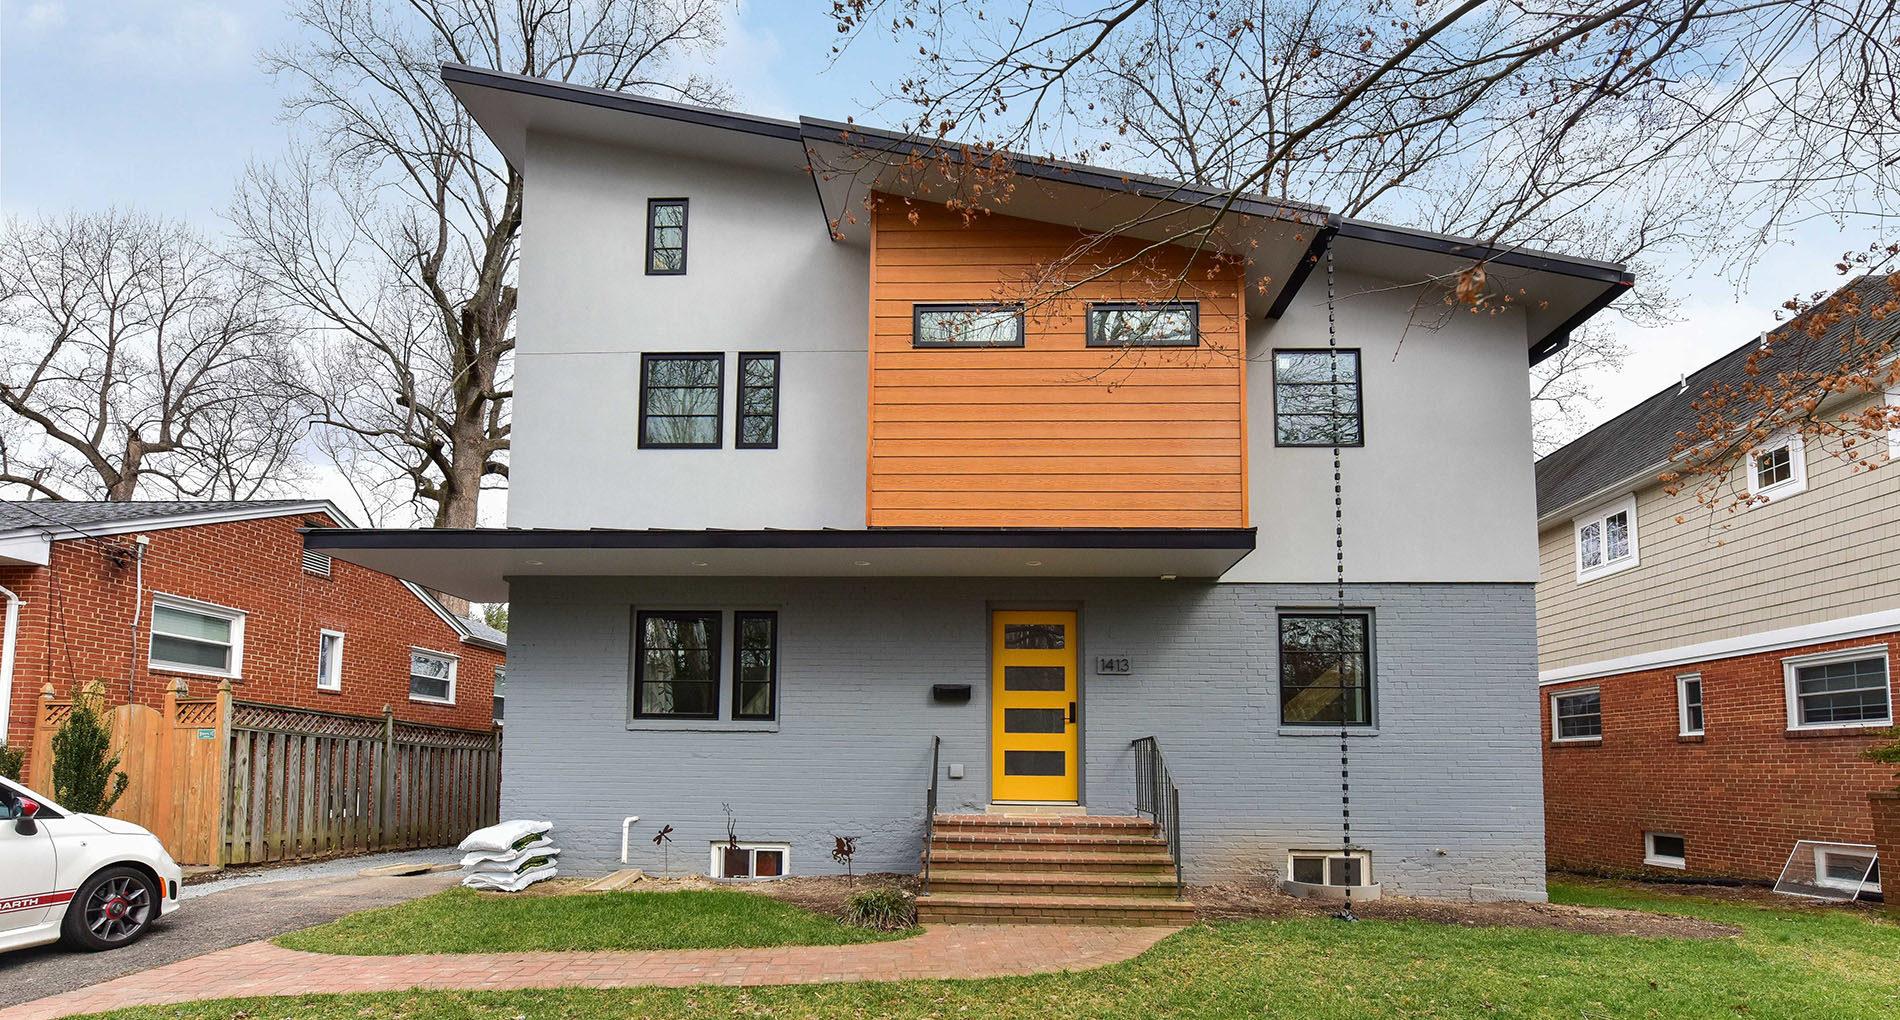 Home Remodel Arlington Contemporary2ndfloorpopup Slider